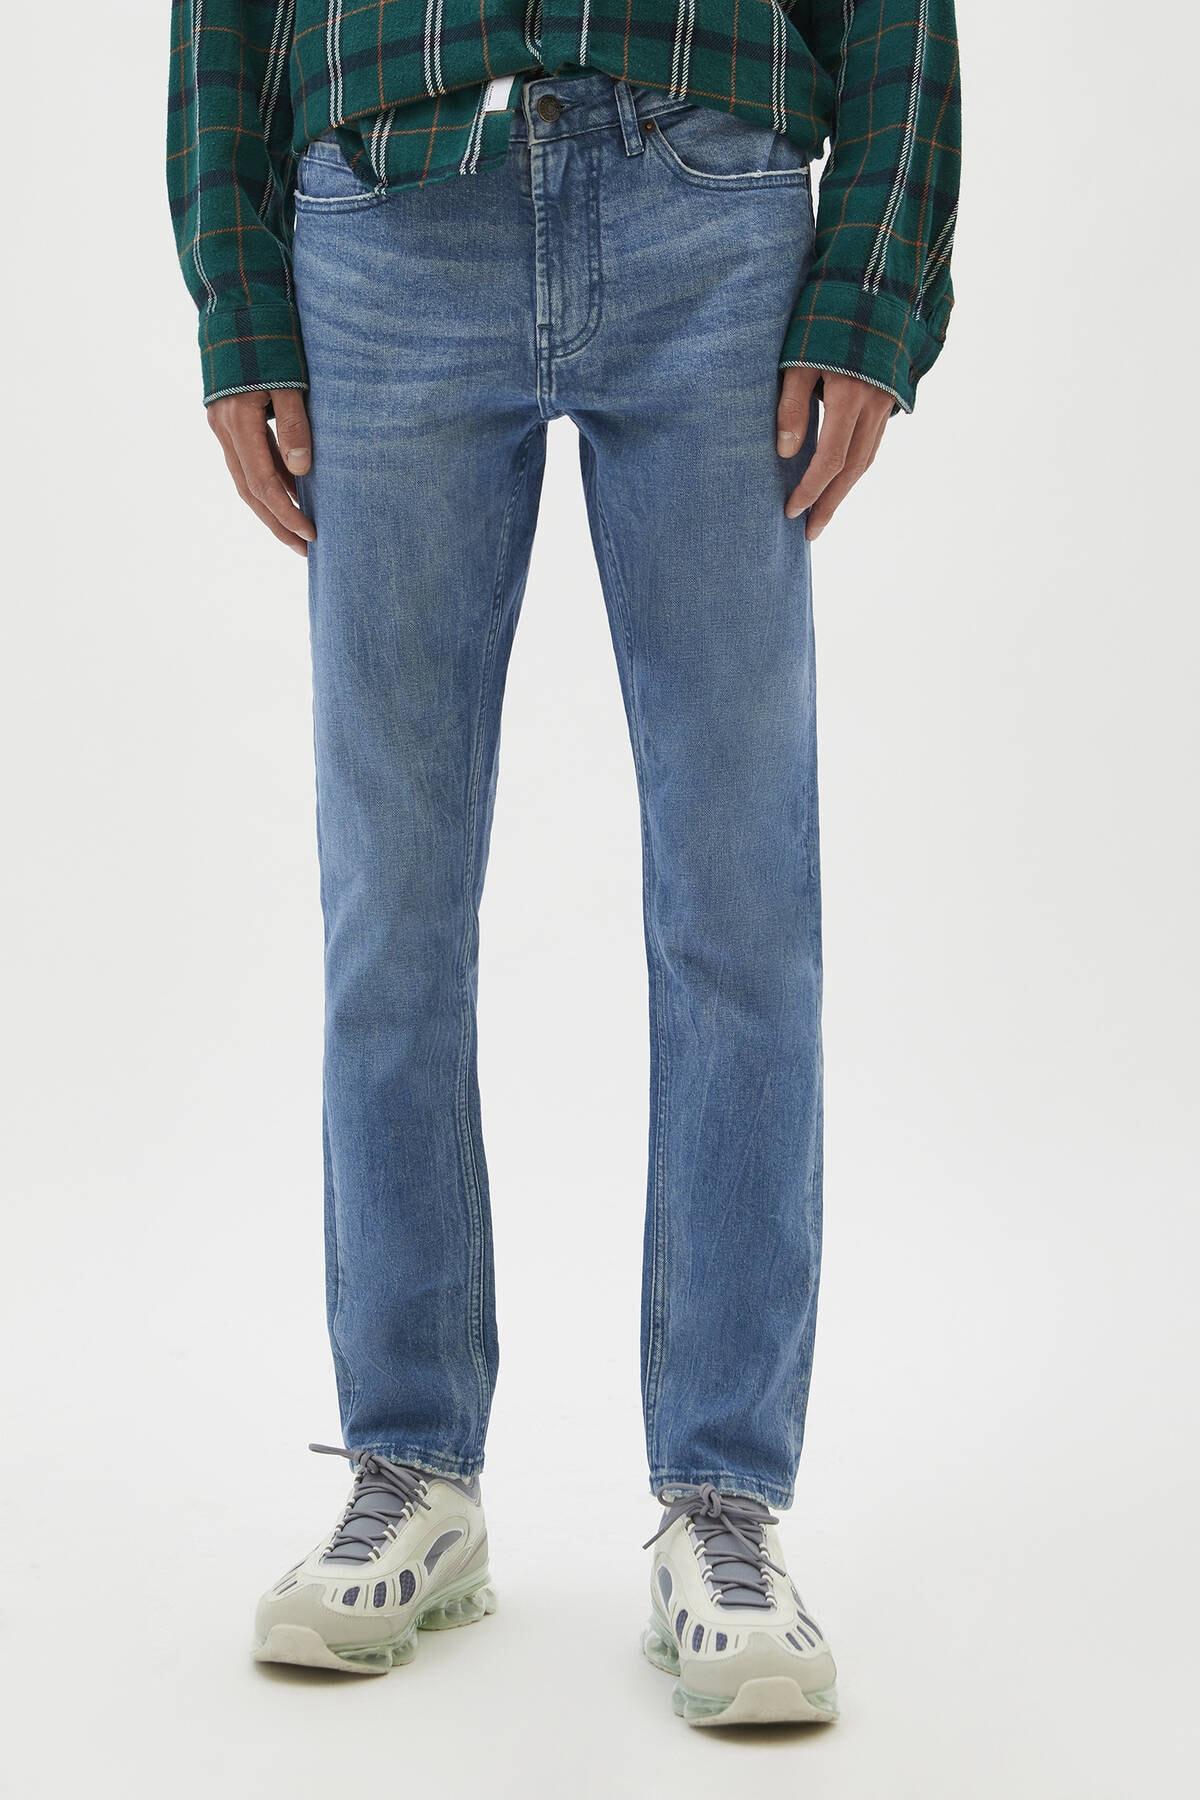 Pull & Bear Erkek Yeşilimsi Mavi Comfort Slim Fit Jean 04681504 2